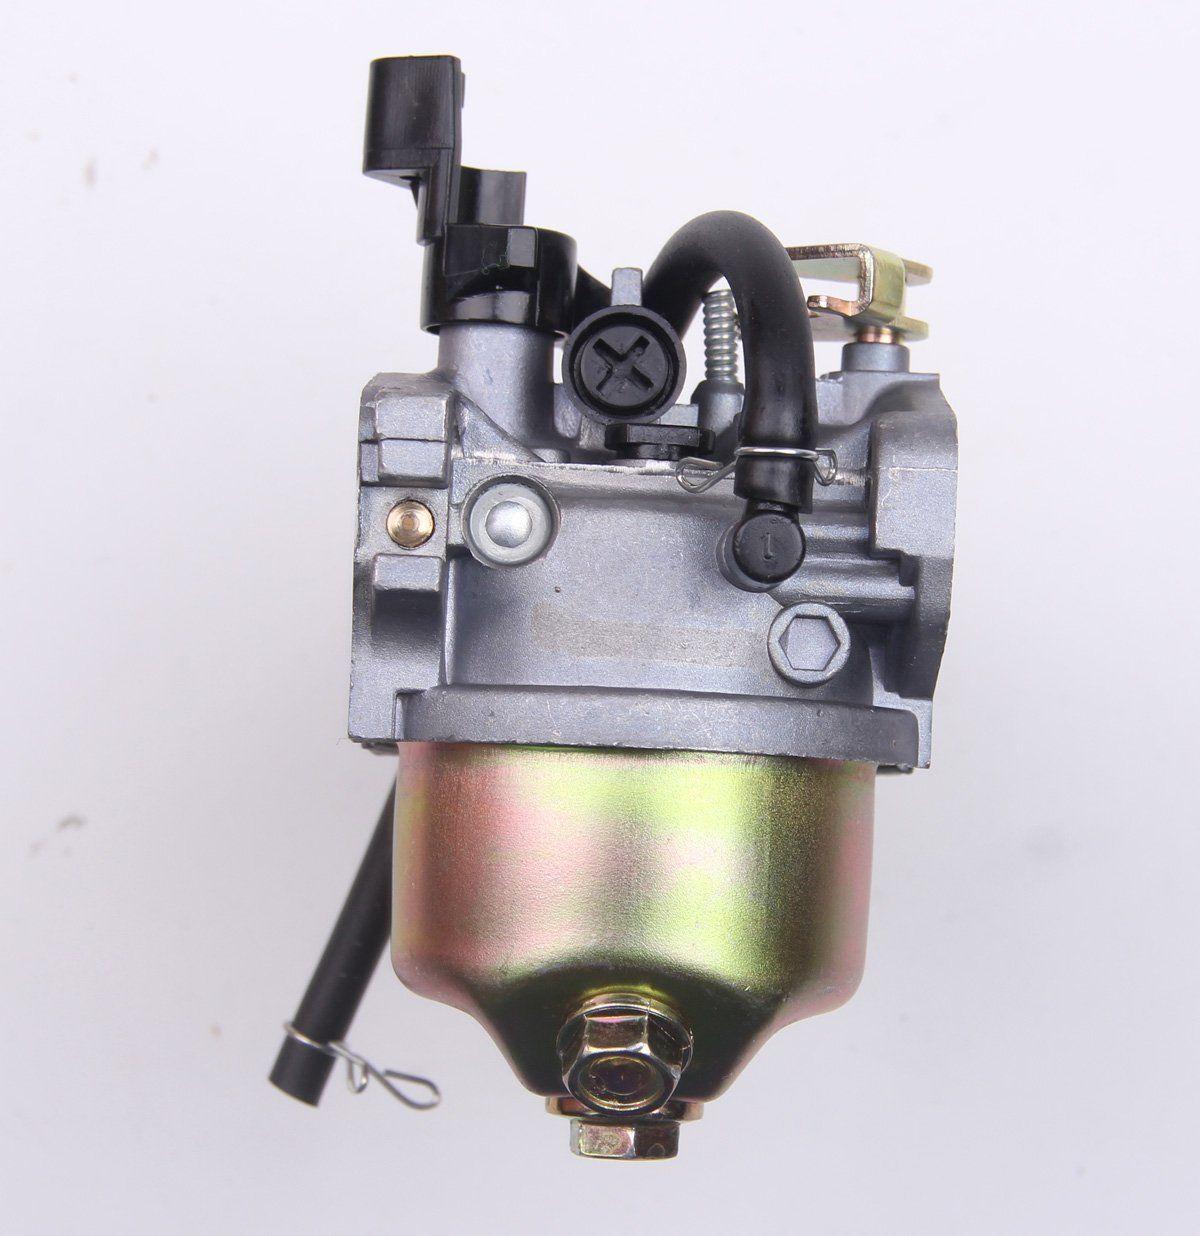 medium resolution of new carburetor with gaskets primer and fuel filter for troy bilt mtd cub cadet snow blower